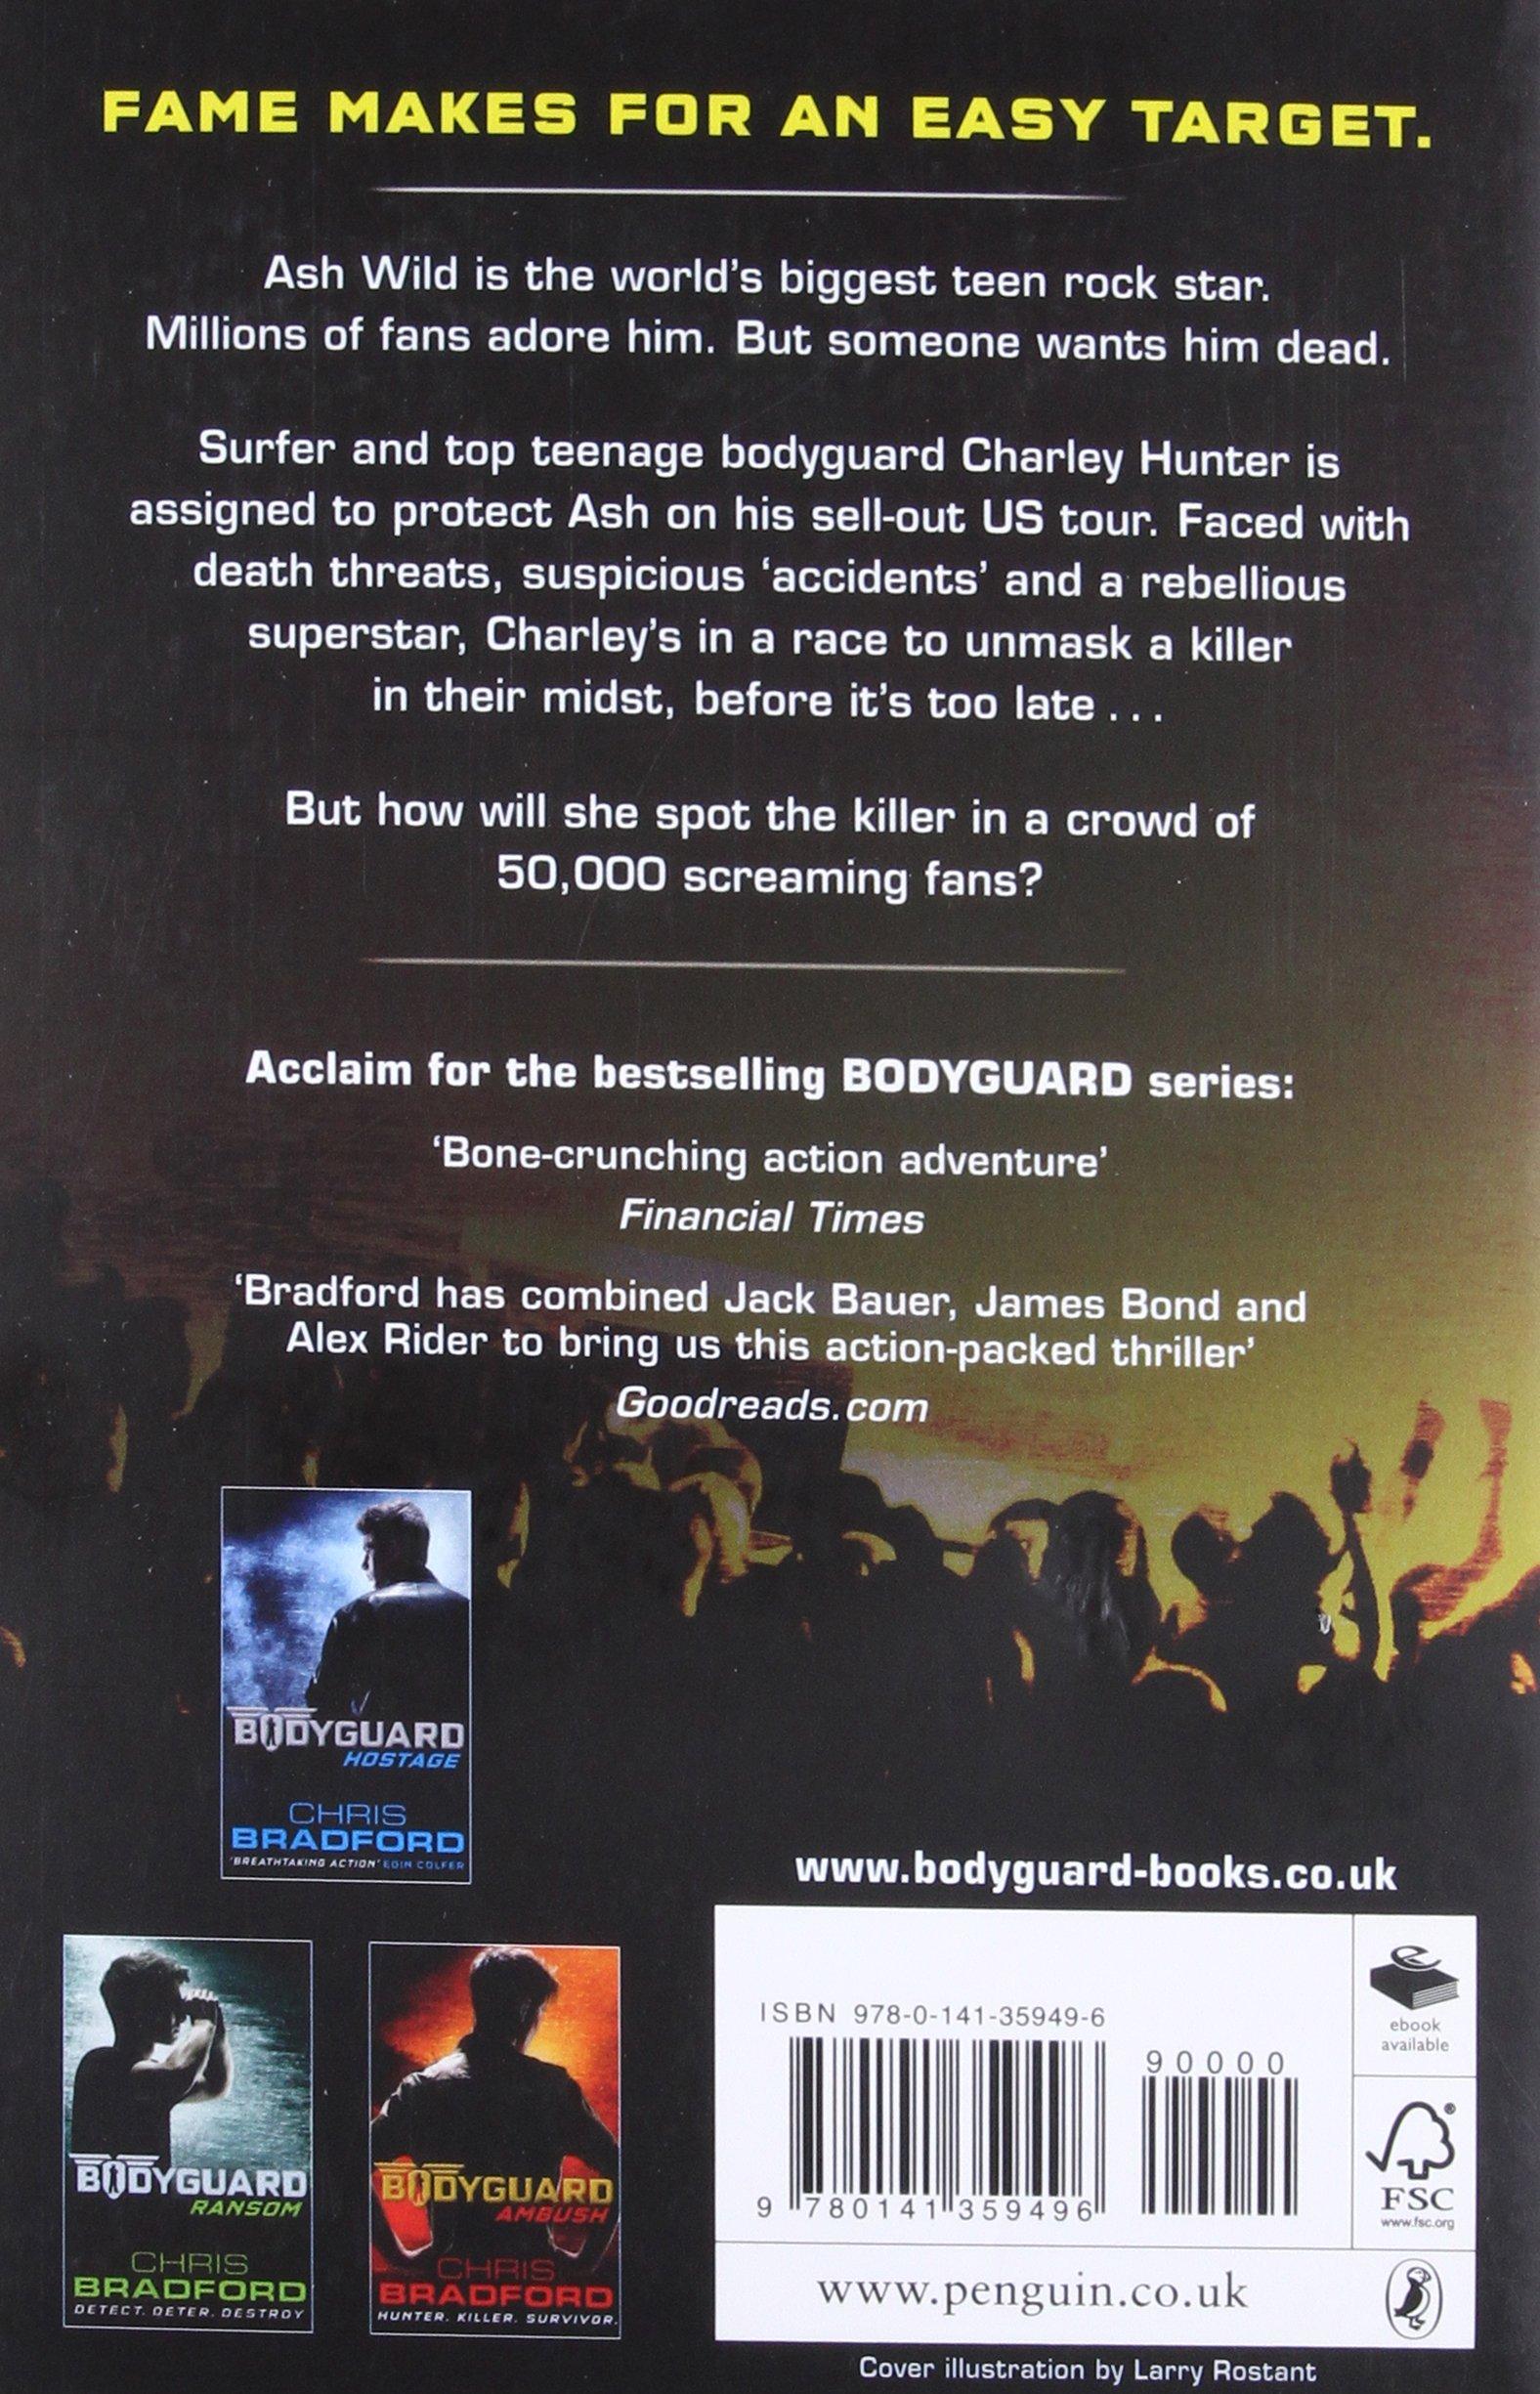 Bodyguard: Target (Book 4): CHRIS BRADFORD: 9780141359496: Amazon ...